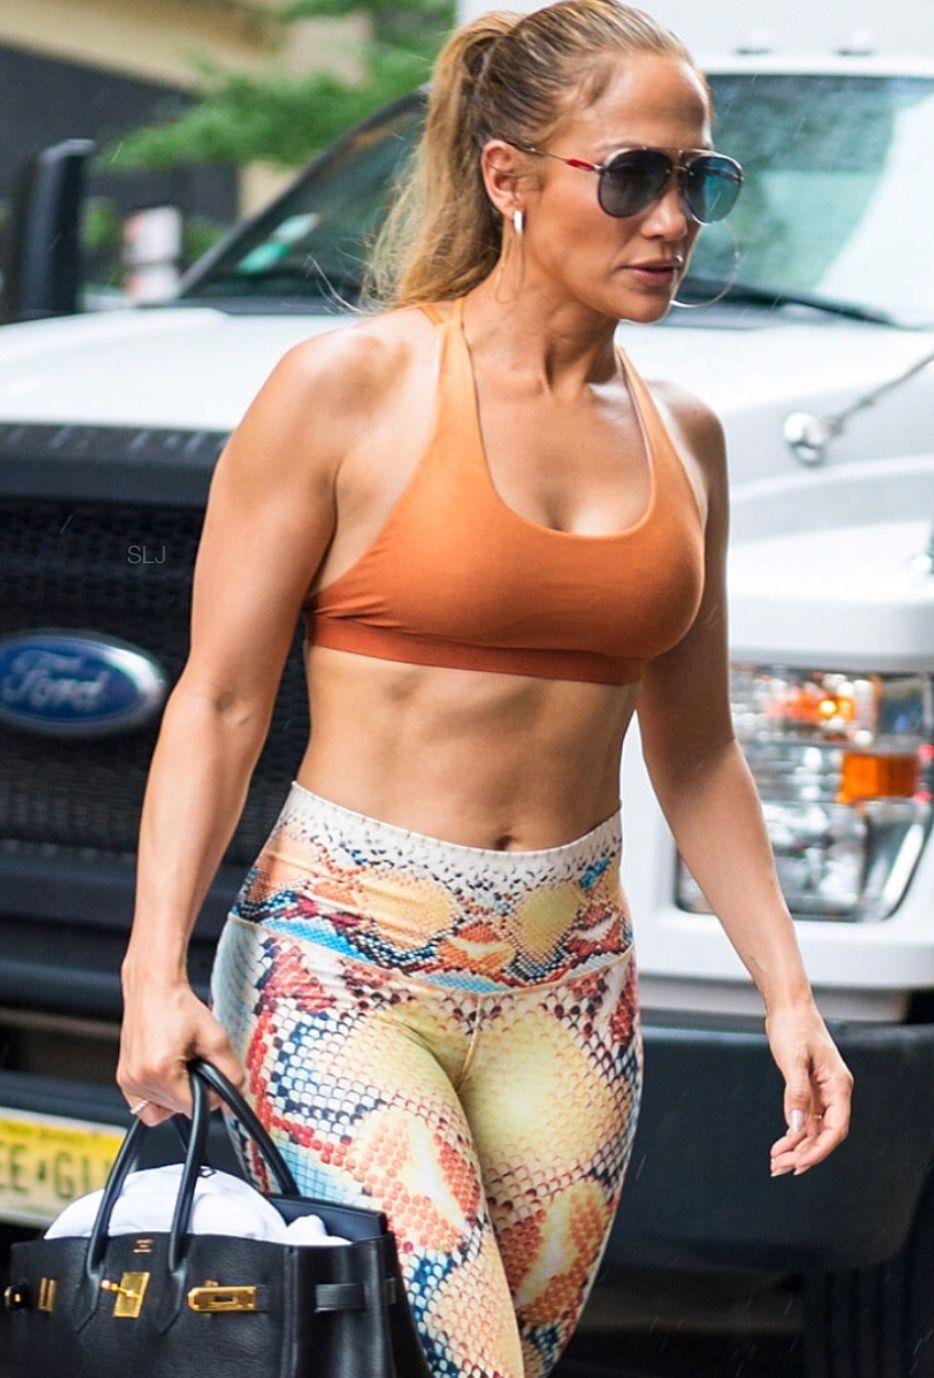 Jennifer Lopez's diet and fitness secrets